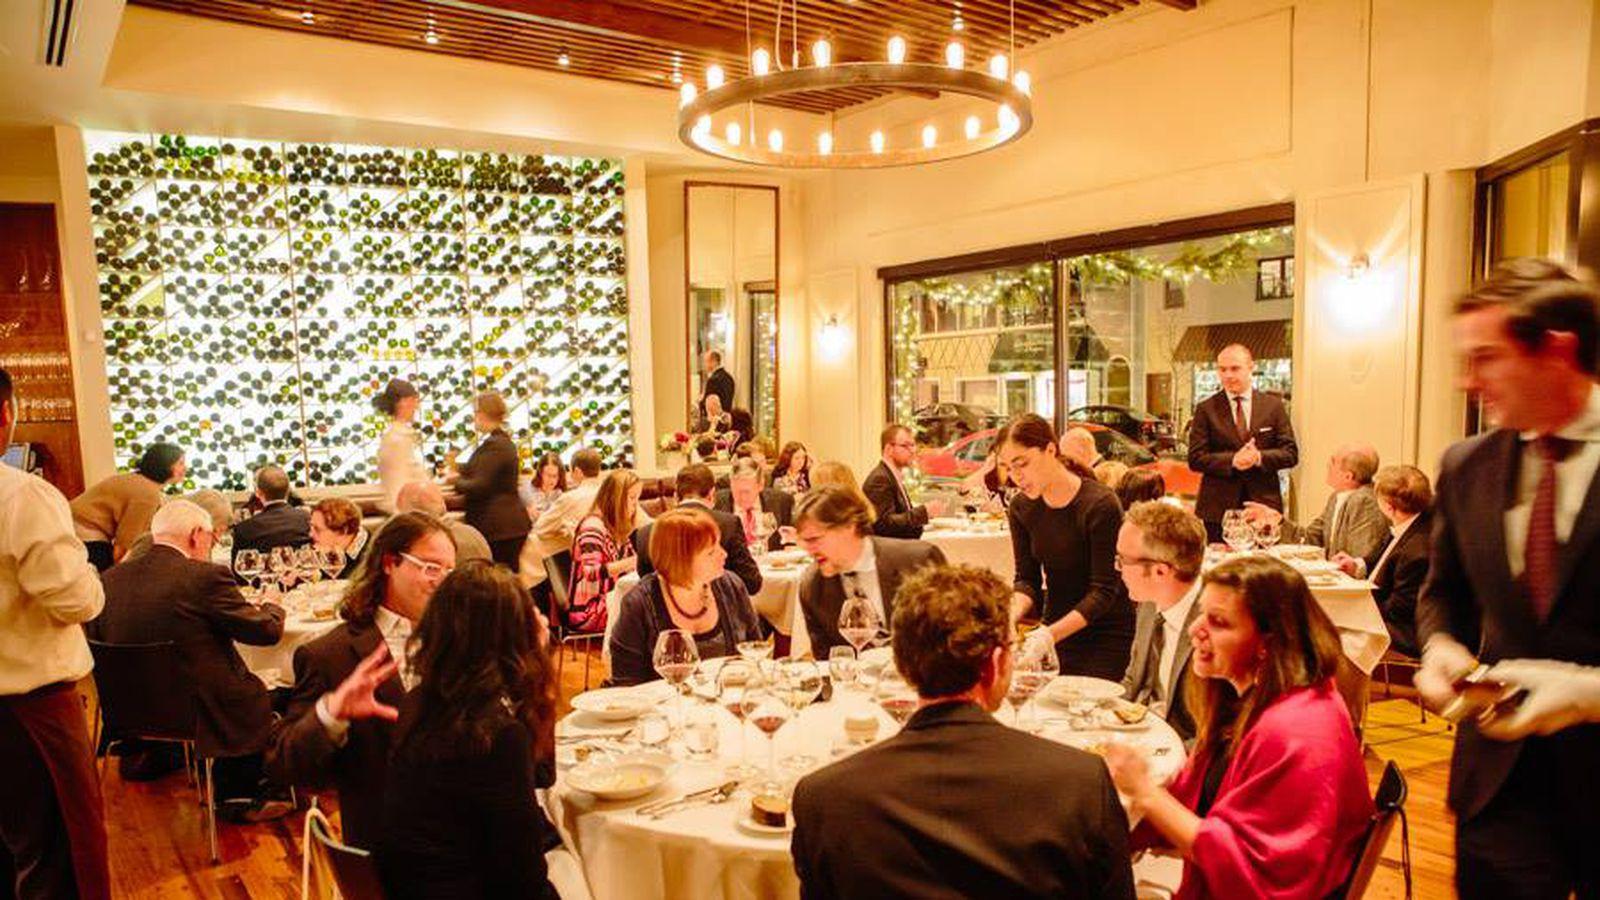 The Best White Tablecloth Restaurants in Denver and Beyond  : 10675504101530918260681497325055874284299490n00 from denver.eater.com size 1600 x 900 jpeg 232kB